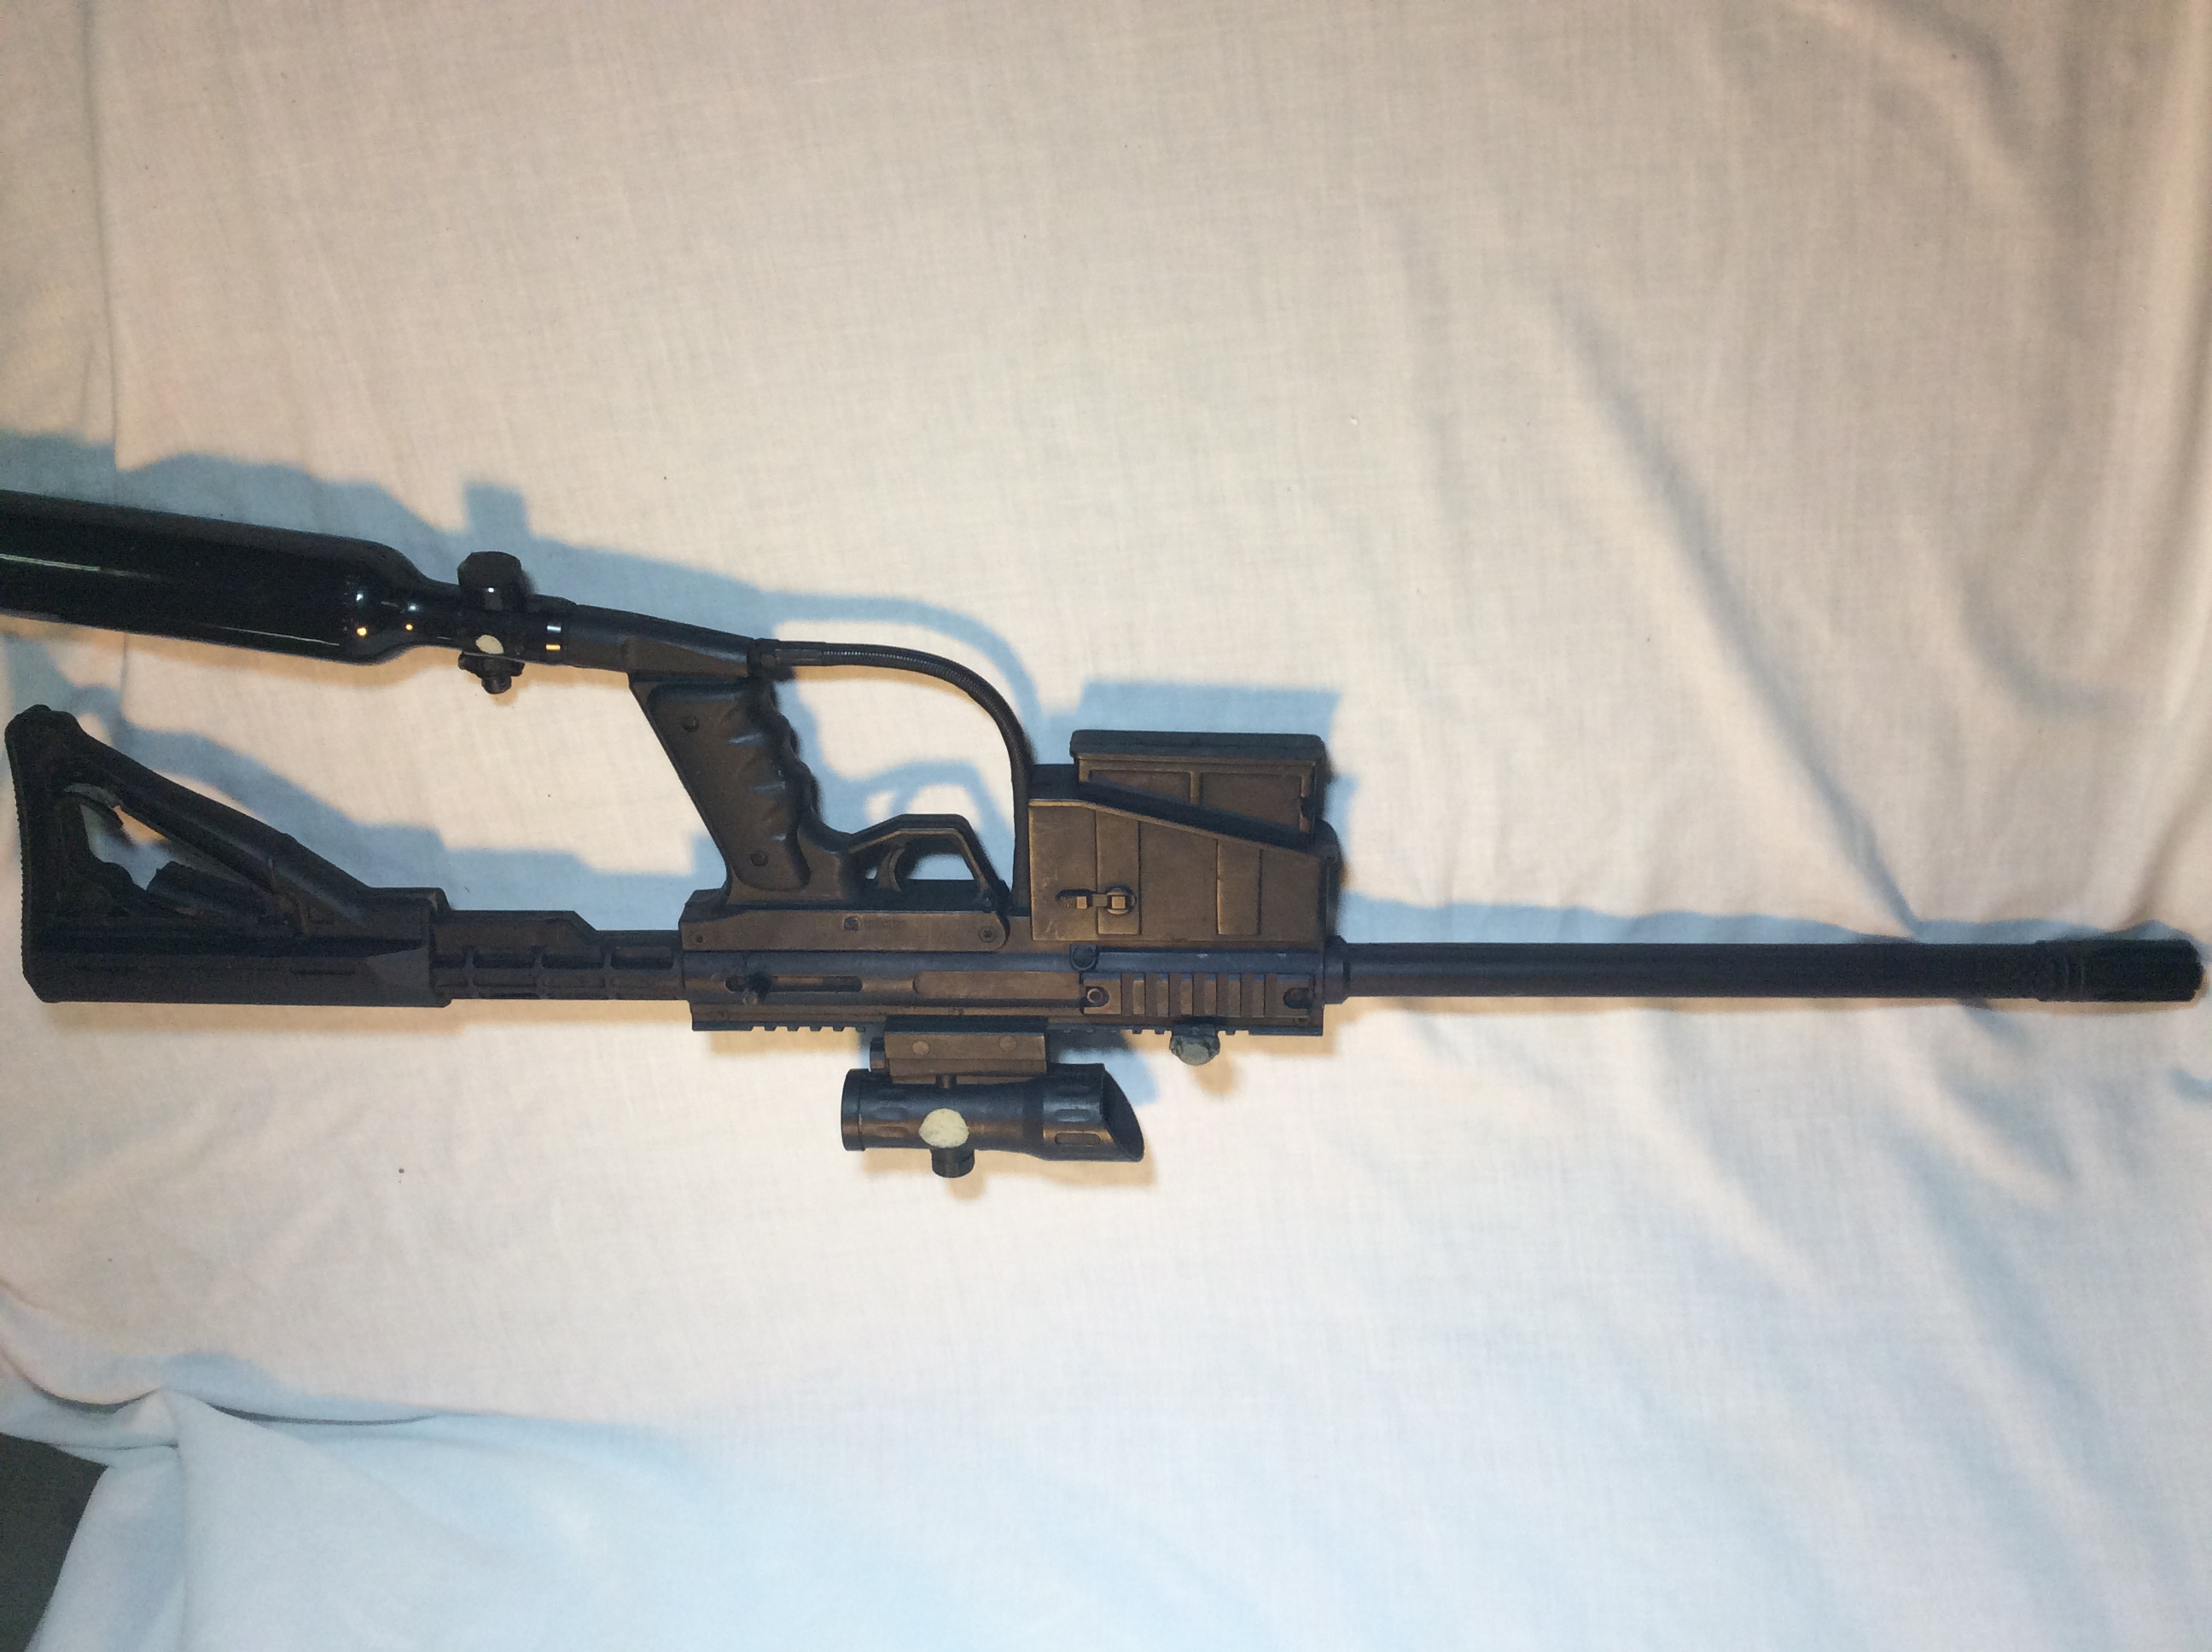 Rubber Tranq gun